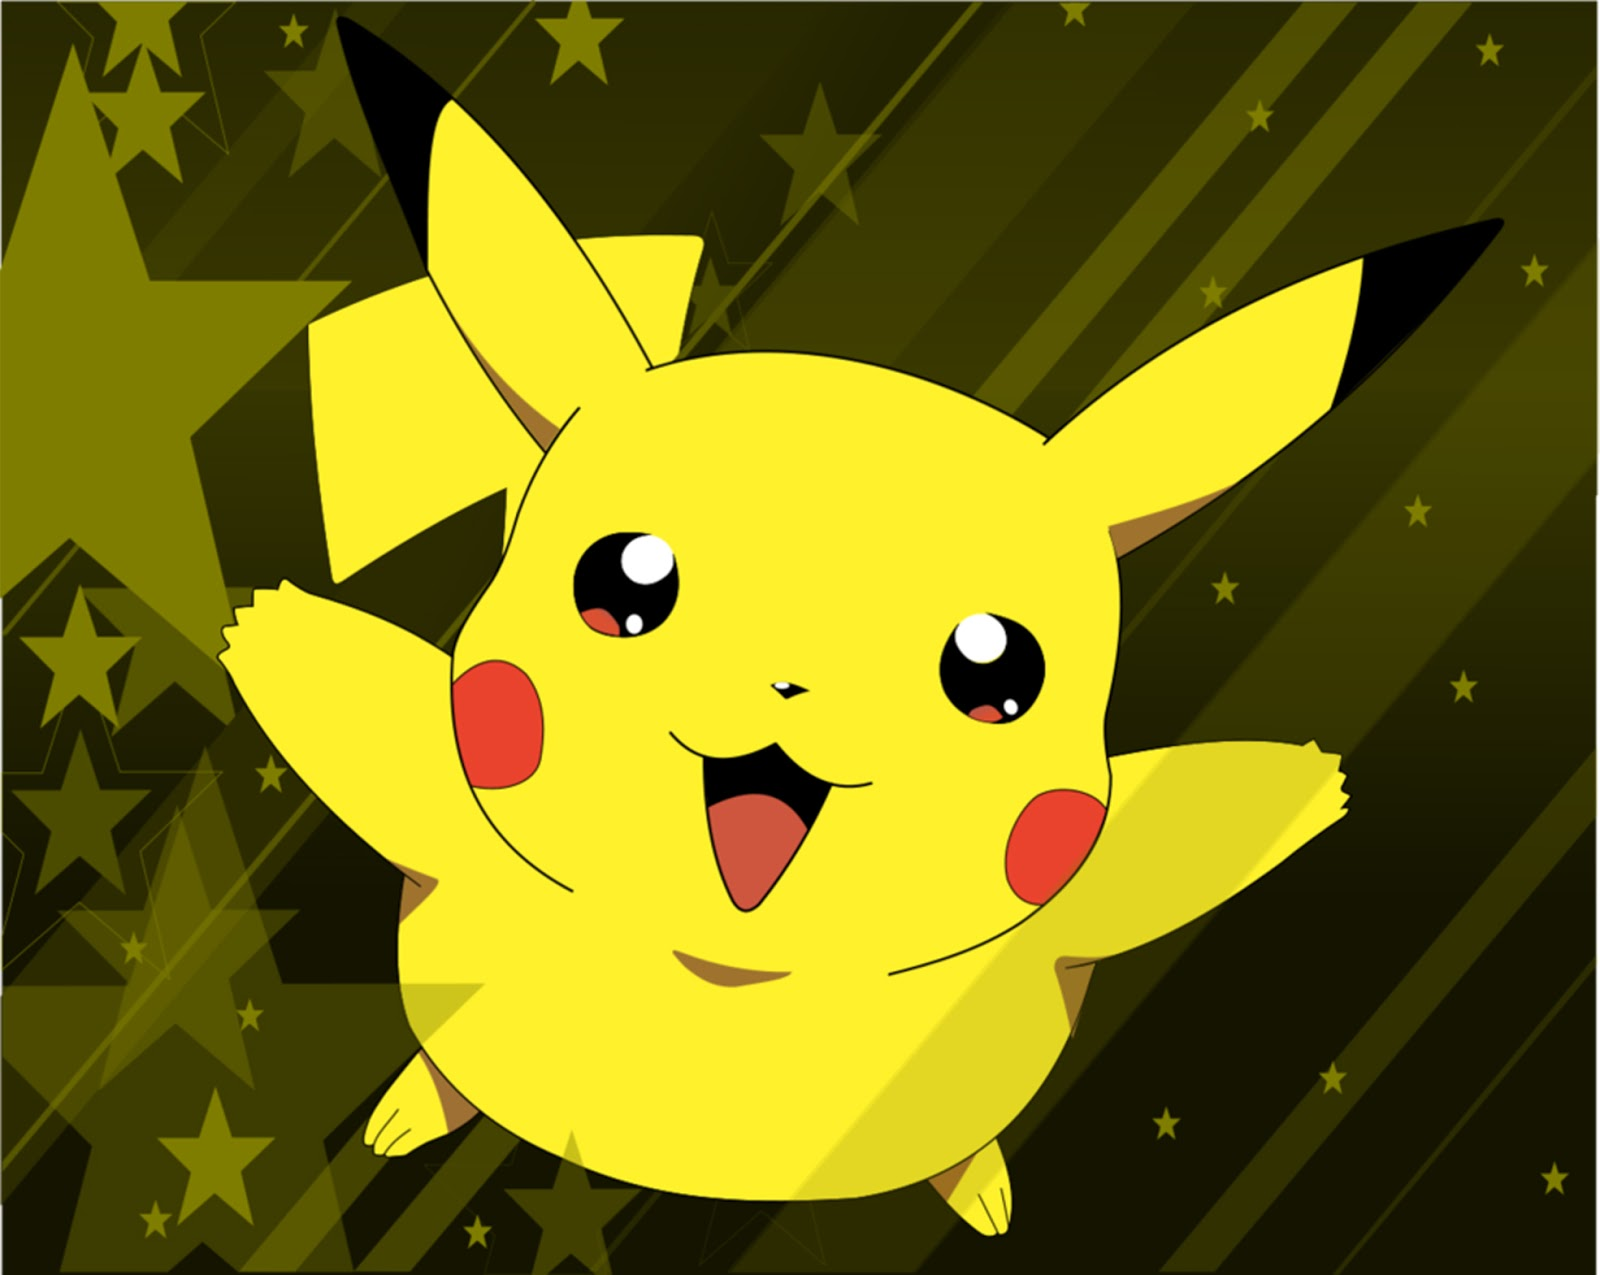 Pikachu wallpaper perfect wallpaper - Images de pikachu ...